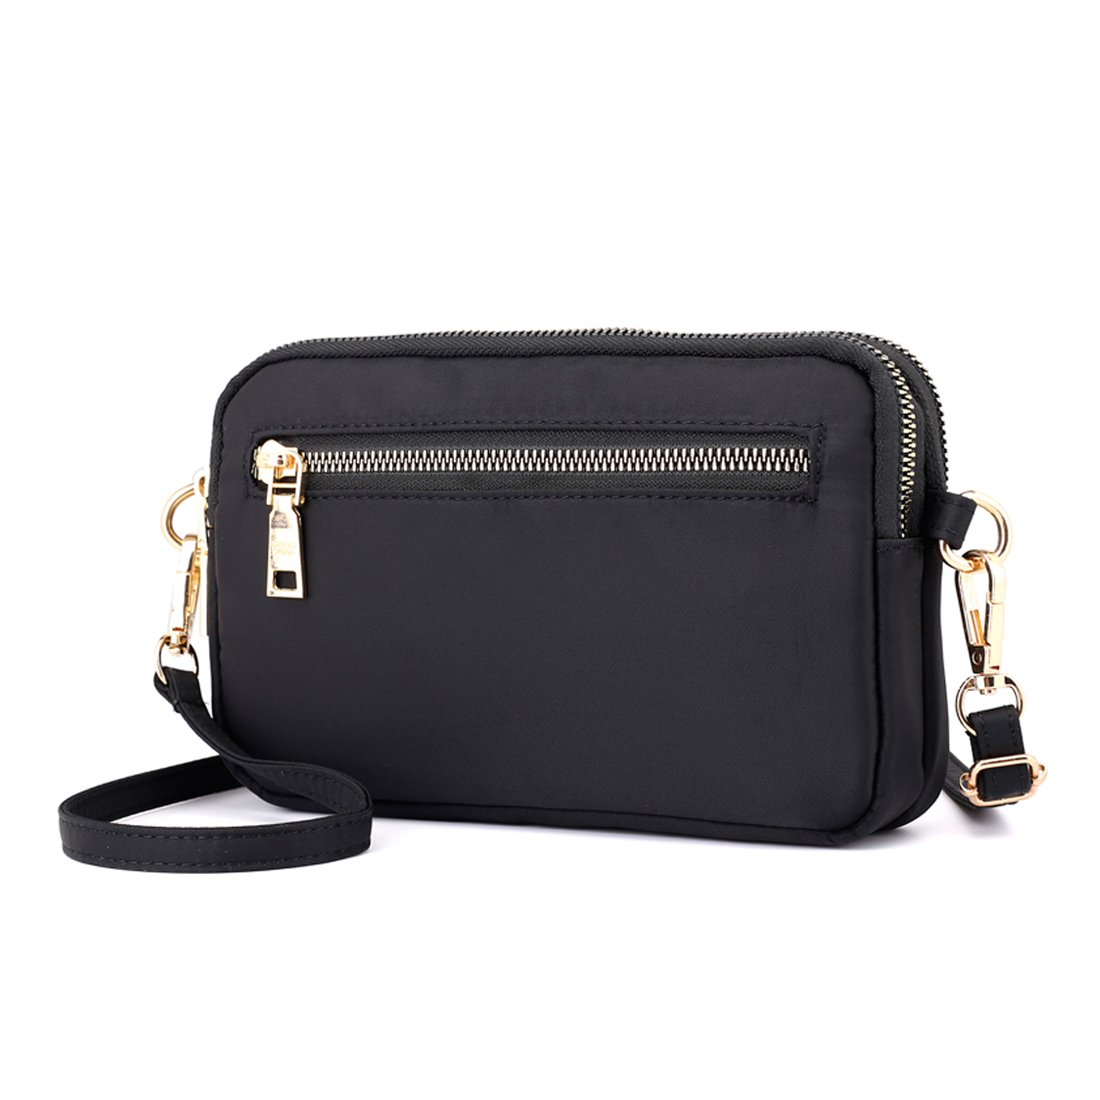 Mynos Crossbody Purse Women Shoulder Bag Clutch With Wristlet Strap phone Wallet